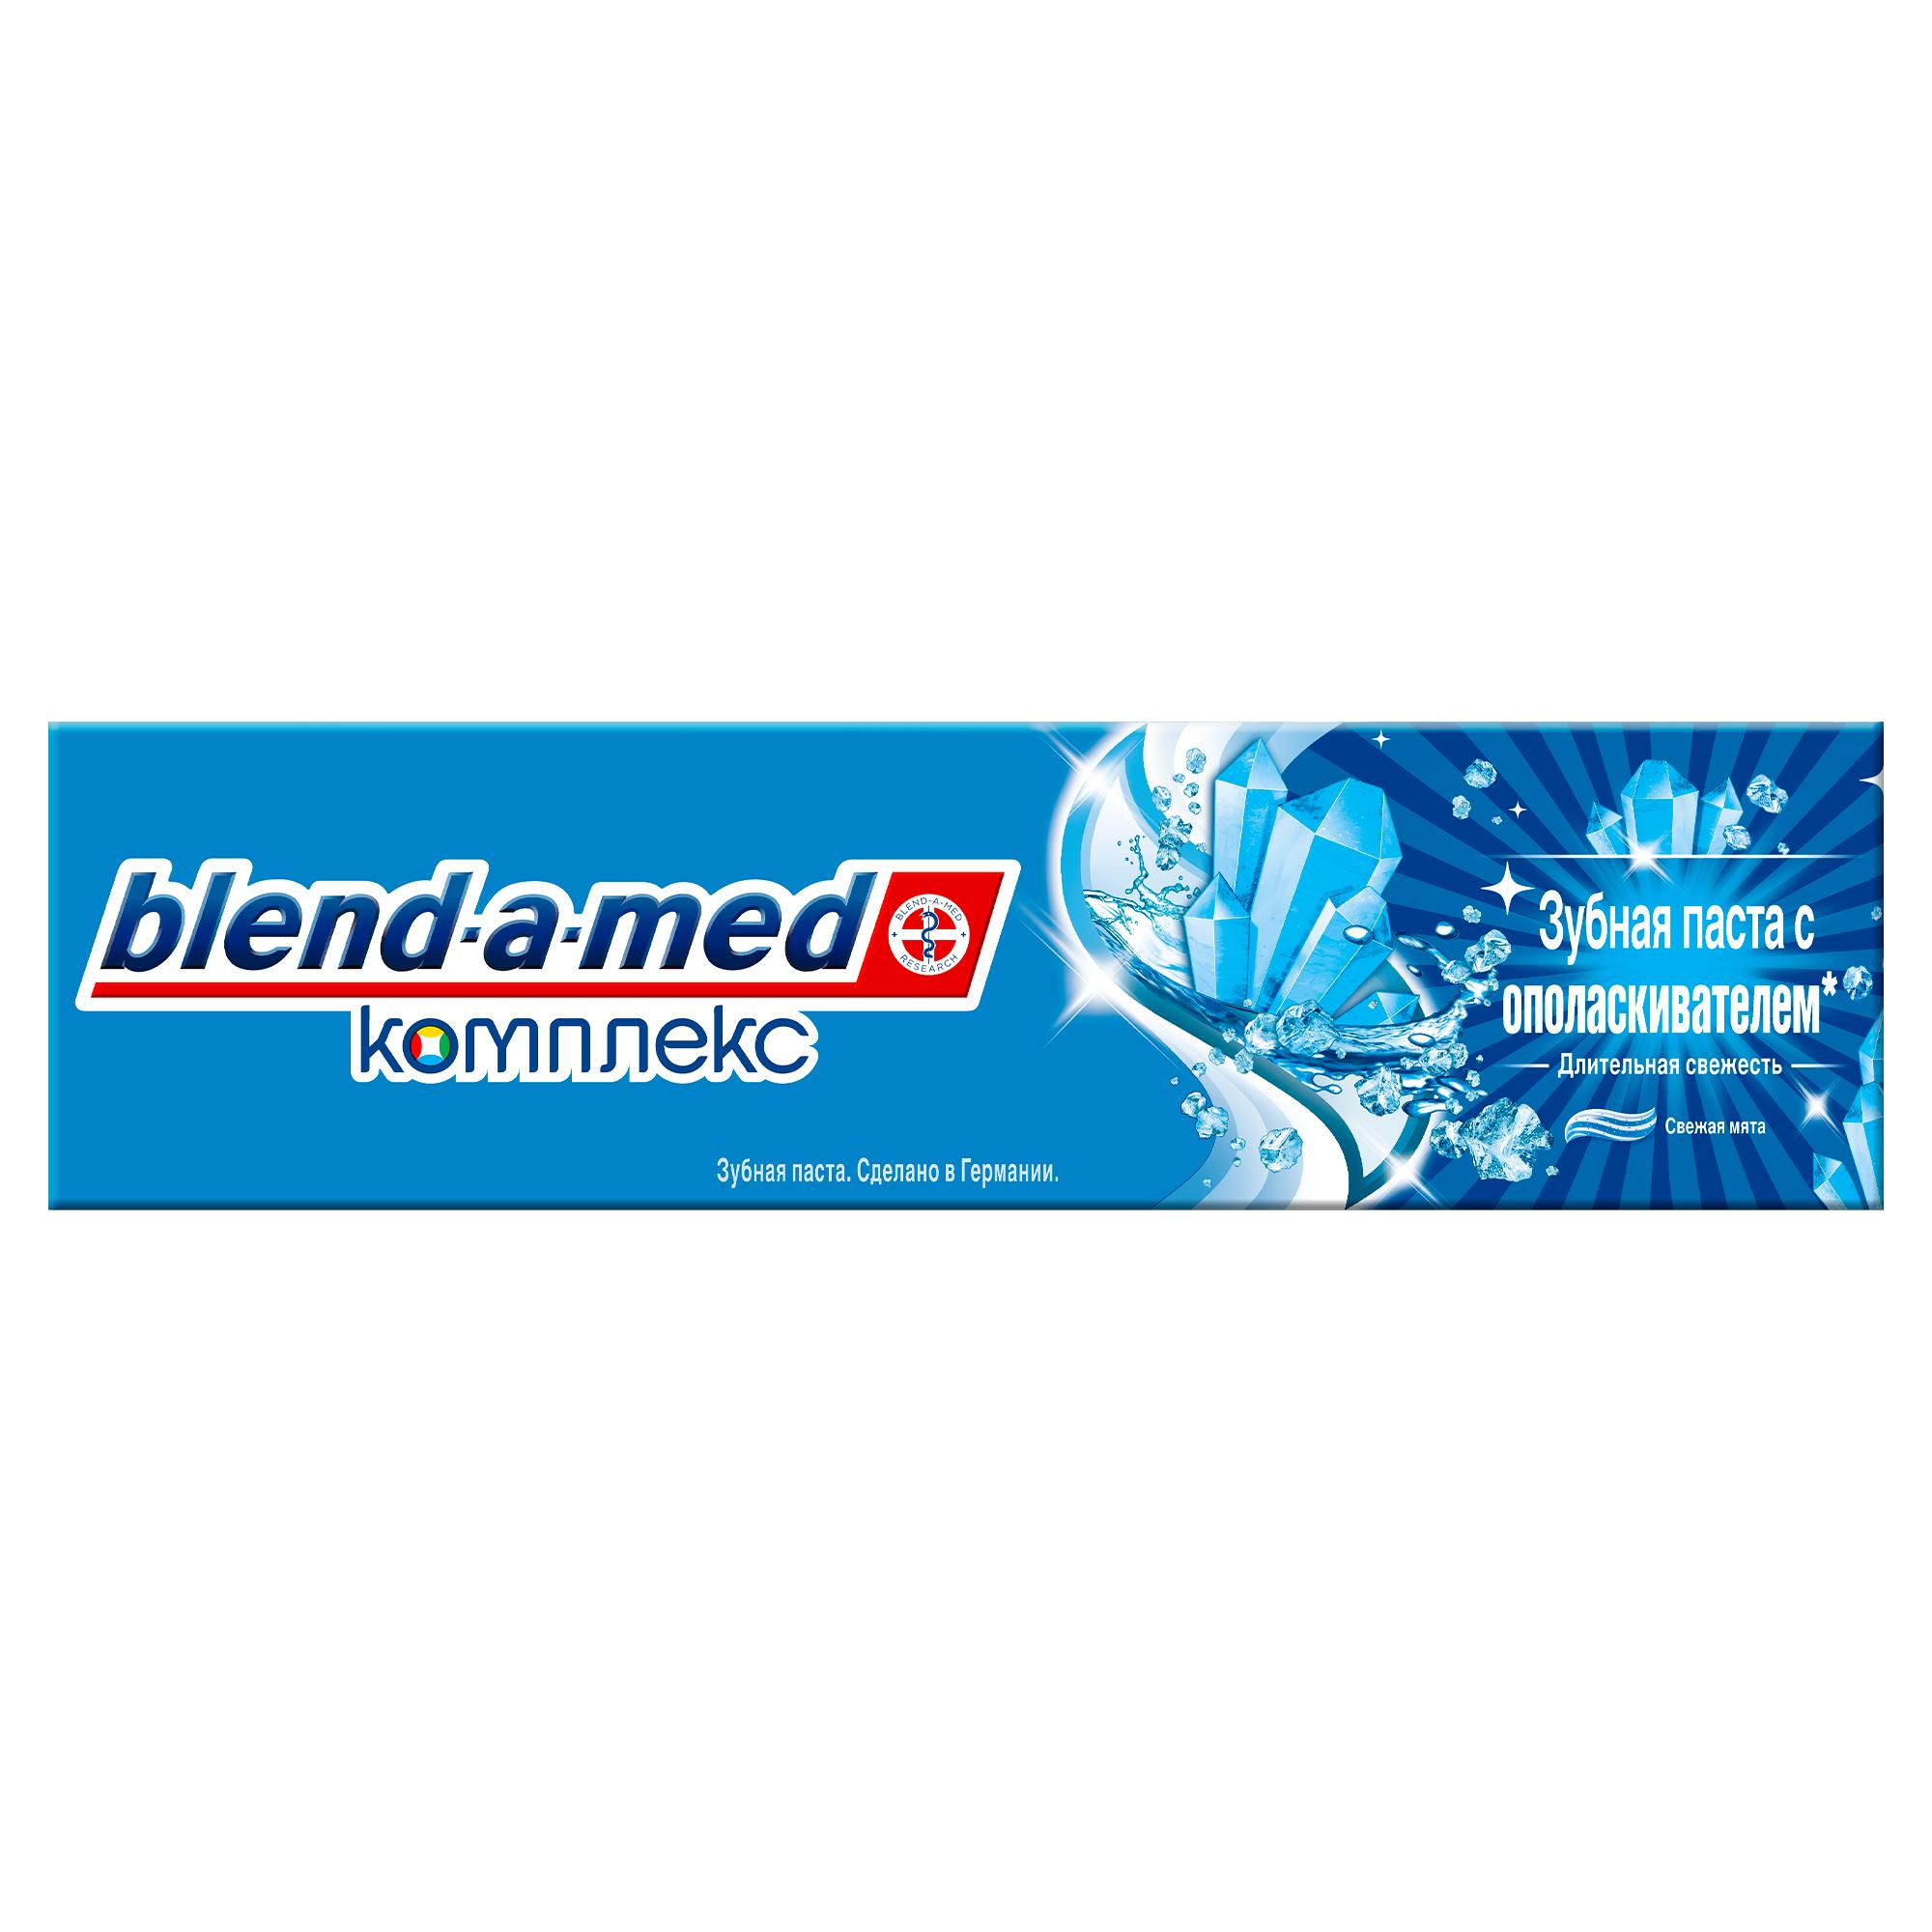 Фото - Зубная паста Blend-a-med Complete 7 Экстра Свежесть 100 мл. зубная паста blend a med экстра свежесть 100 мл